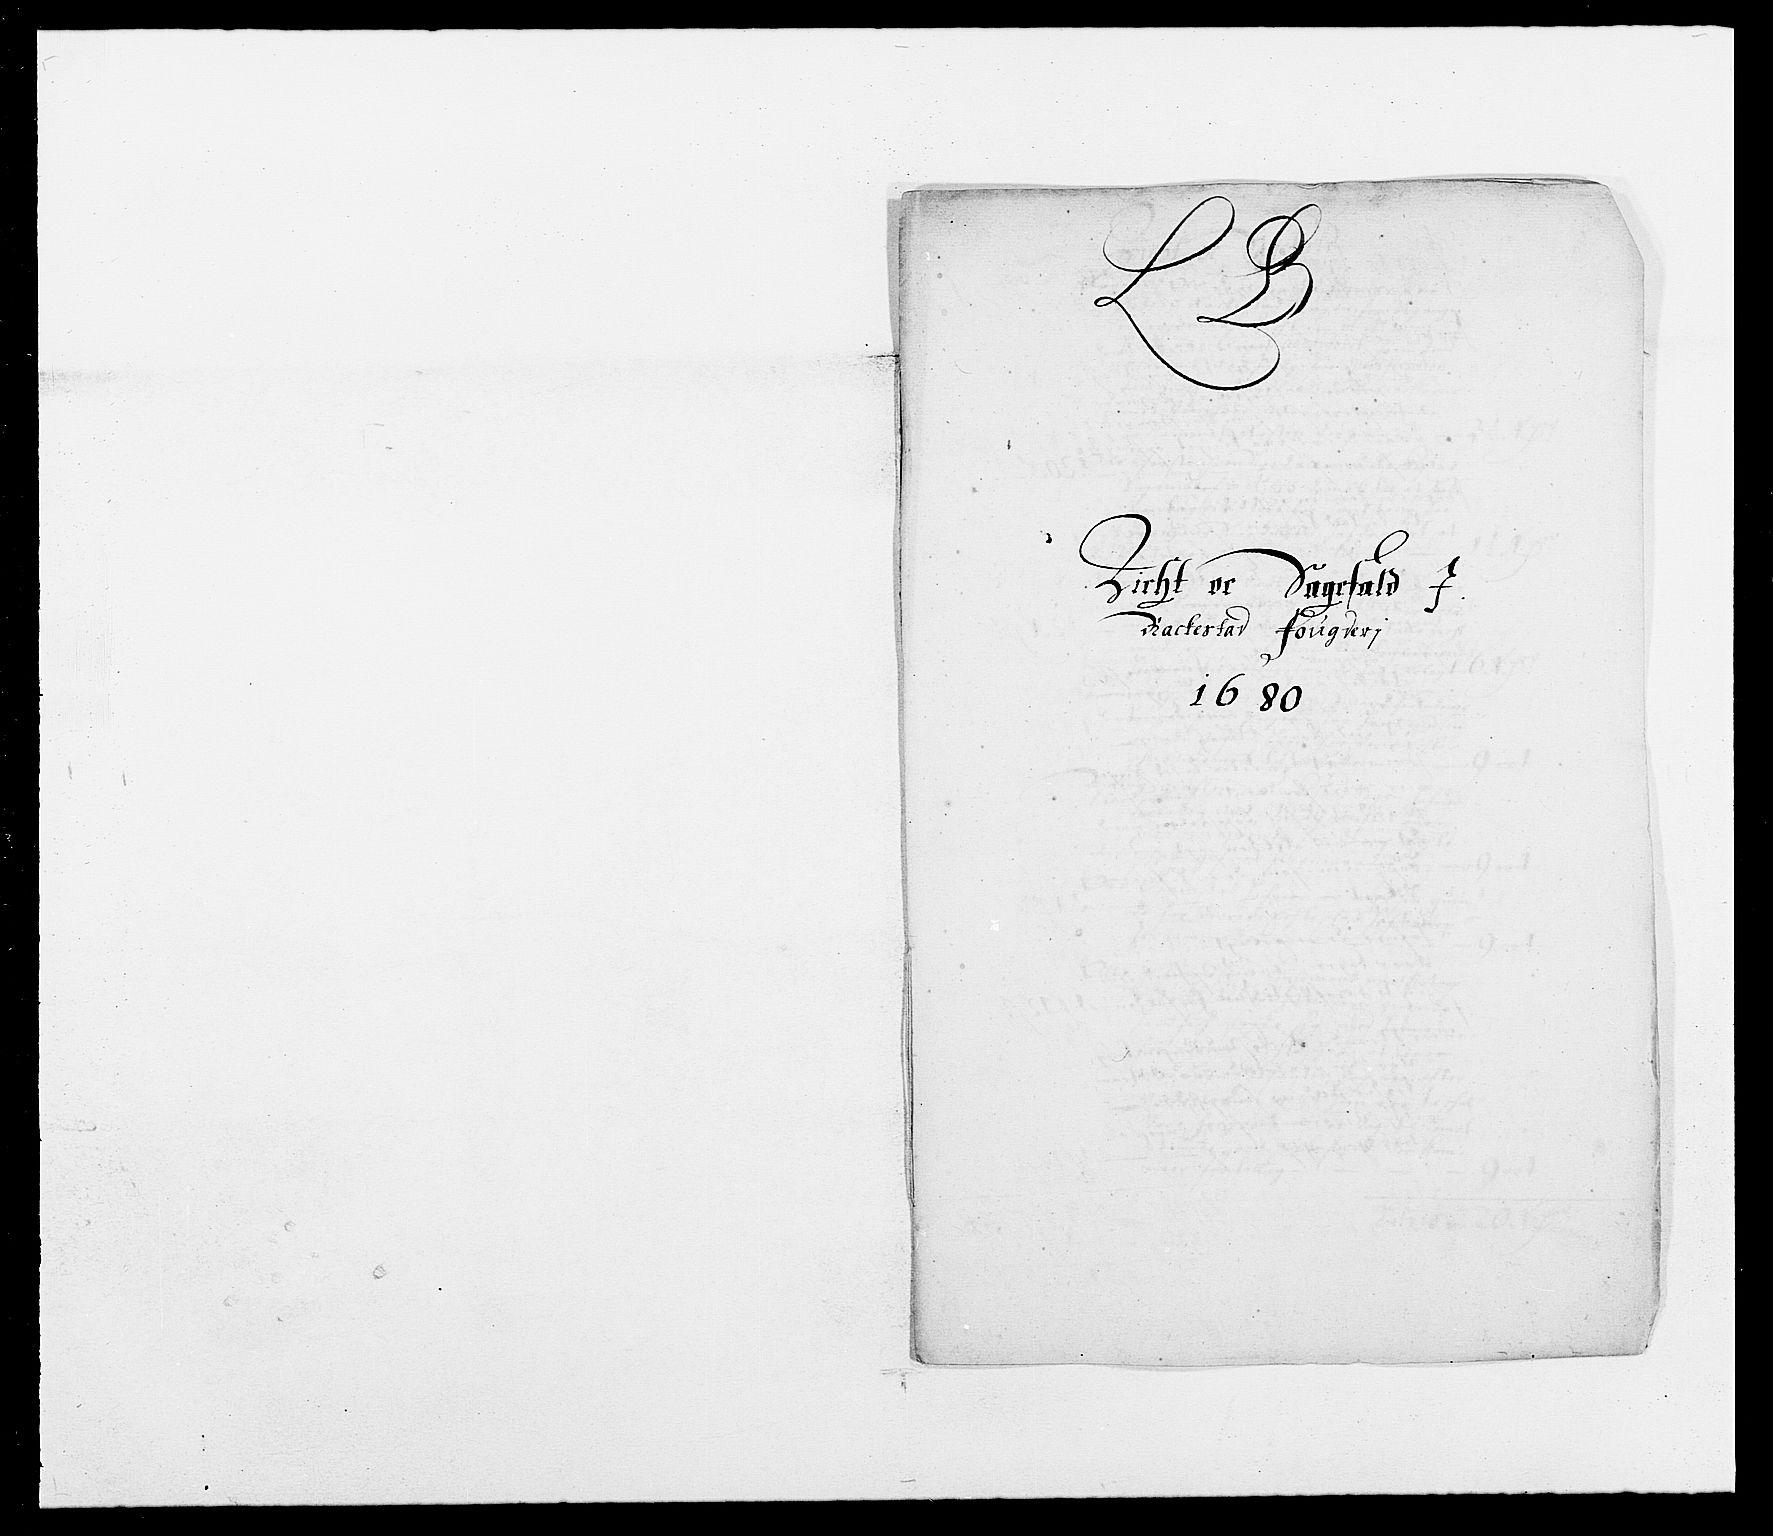 RA, Rentekammeret inntil 1814, Reviderte regnskaper, Fogderegnskap, R05/L0272: Fogderegnskap Rakkestad, 1680-1681, s. 73